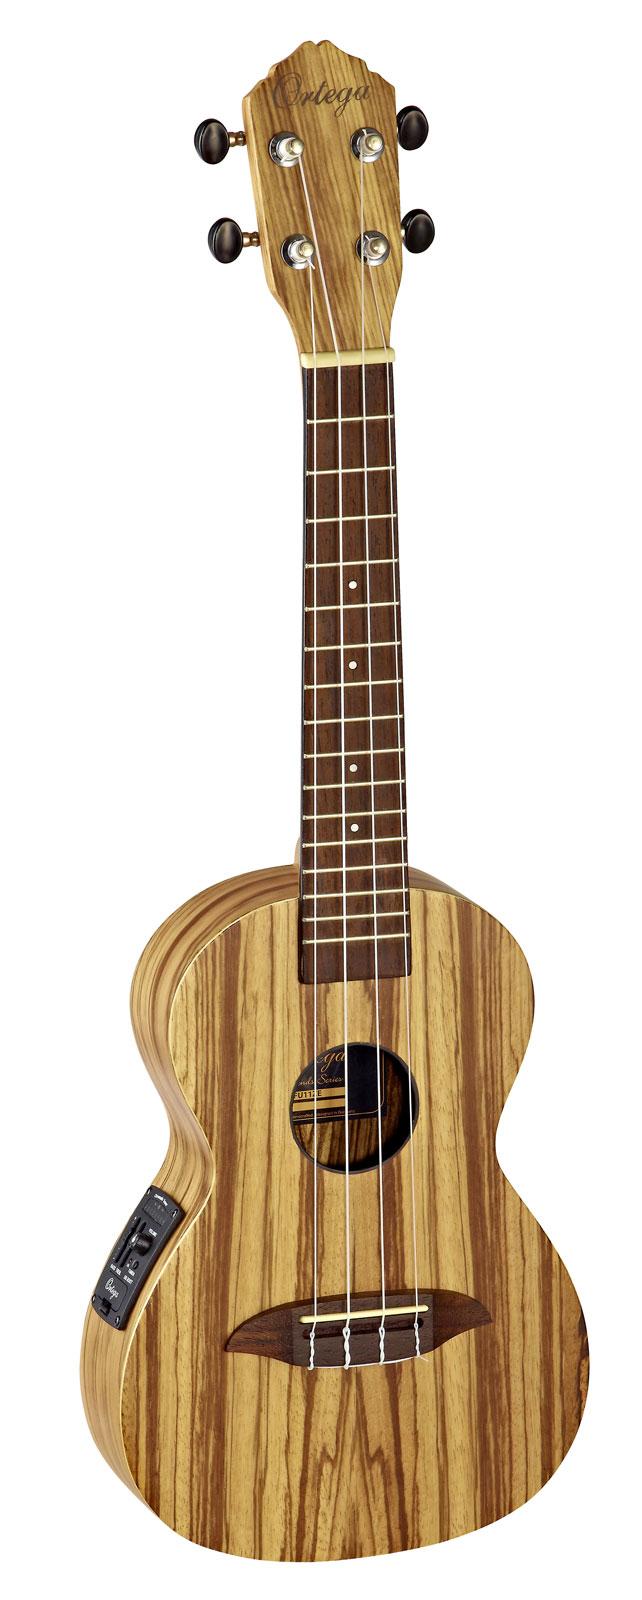 Ortega concert rfu11ze zebrawood natural housse for Housse ukulele concert